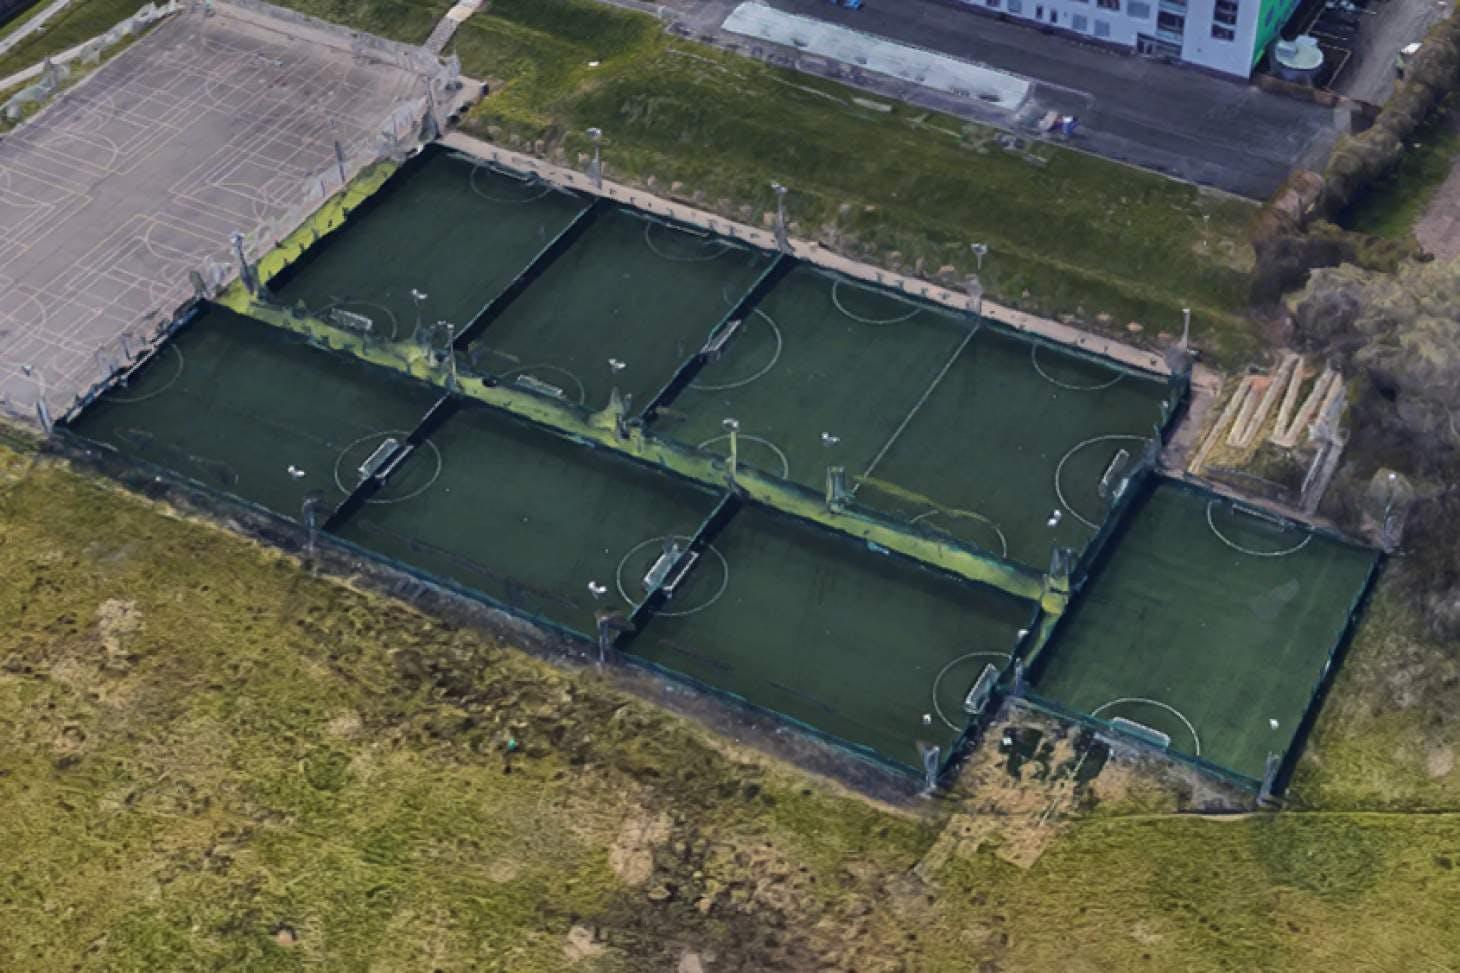 PlayFootball Blackpool 5 a side | 3G Astroturf football pitch